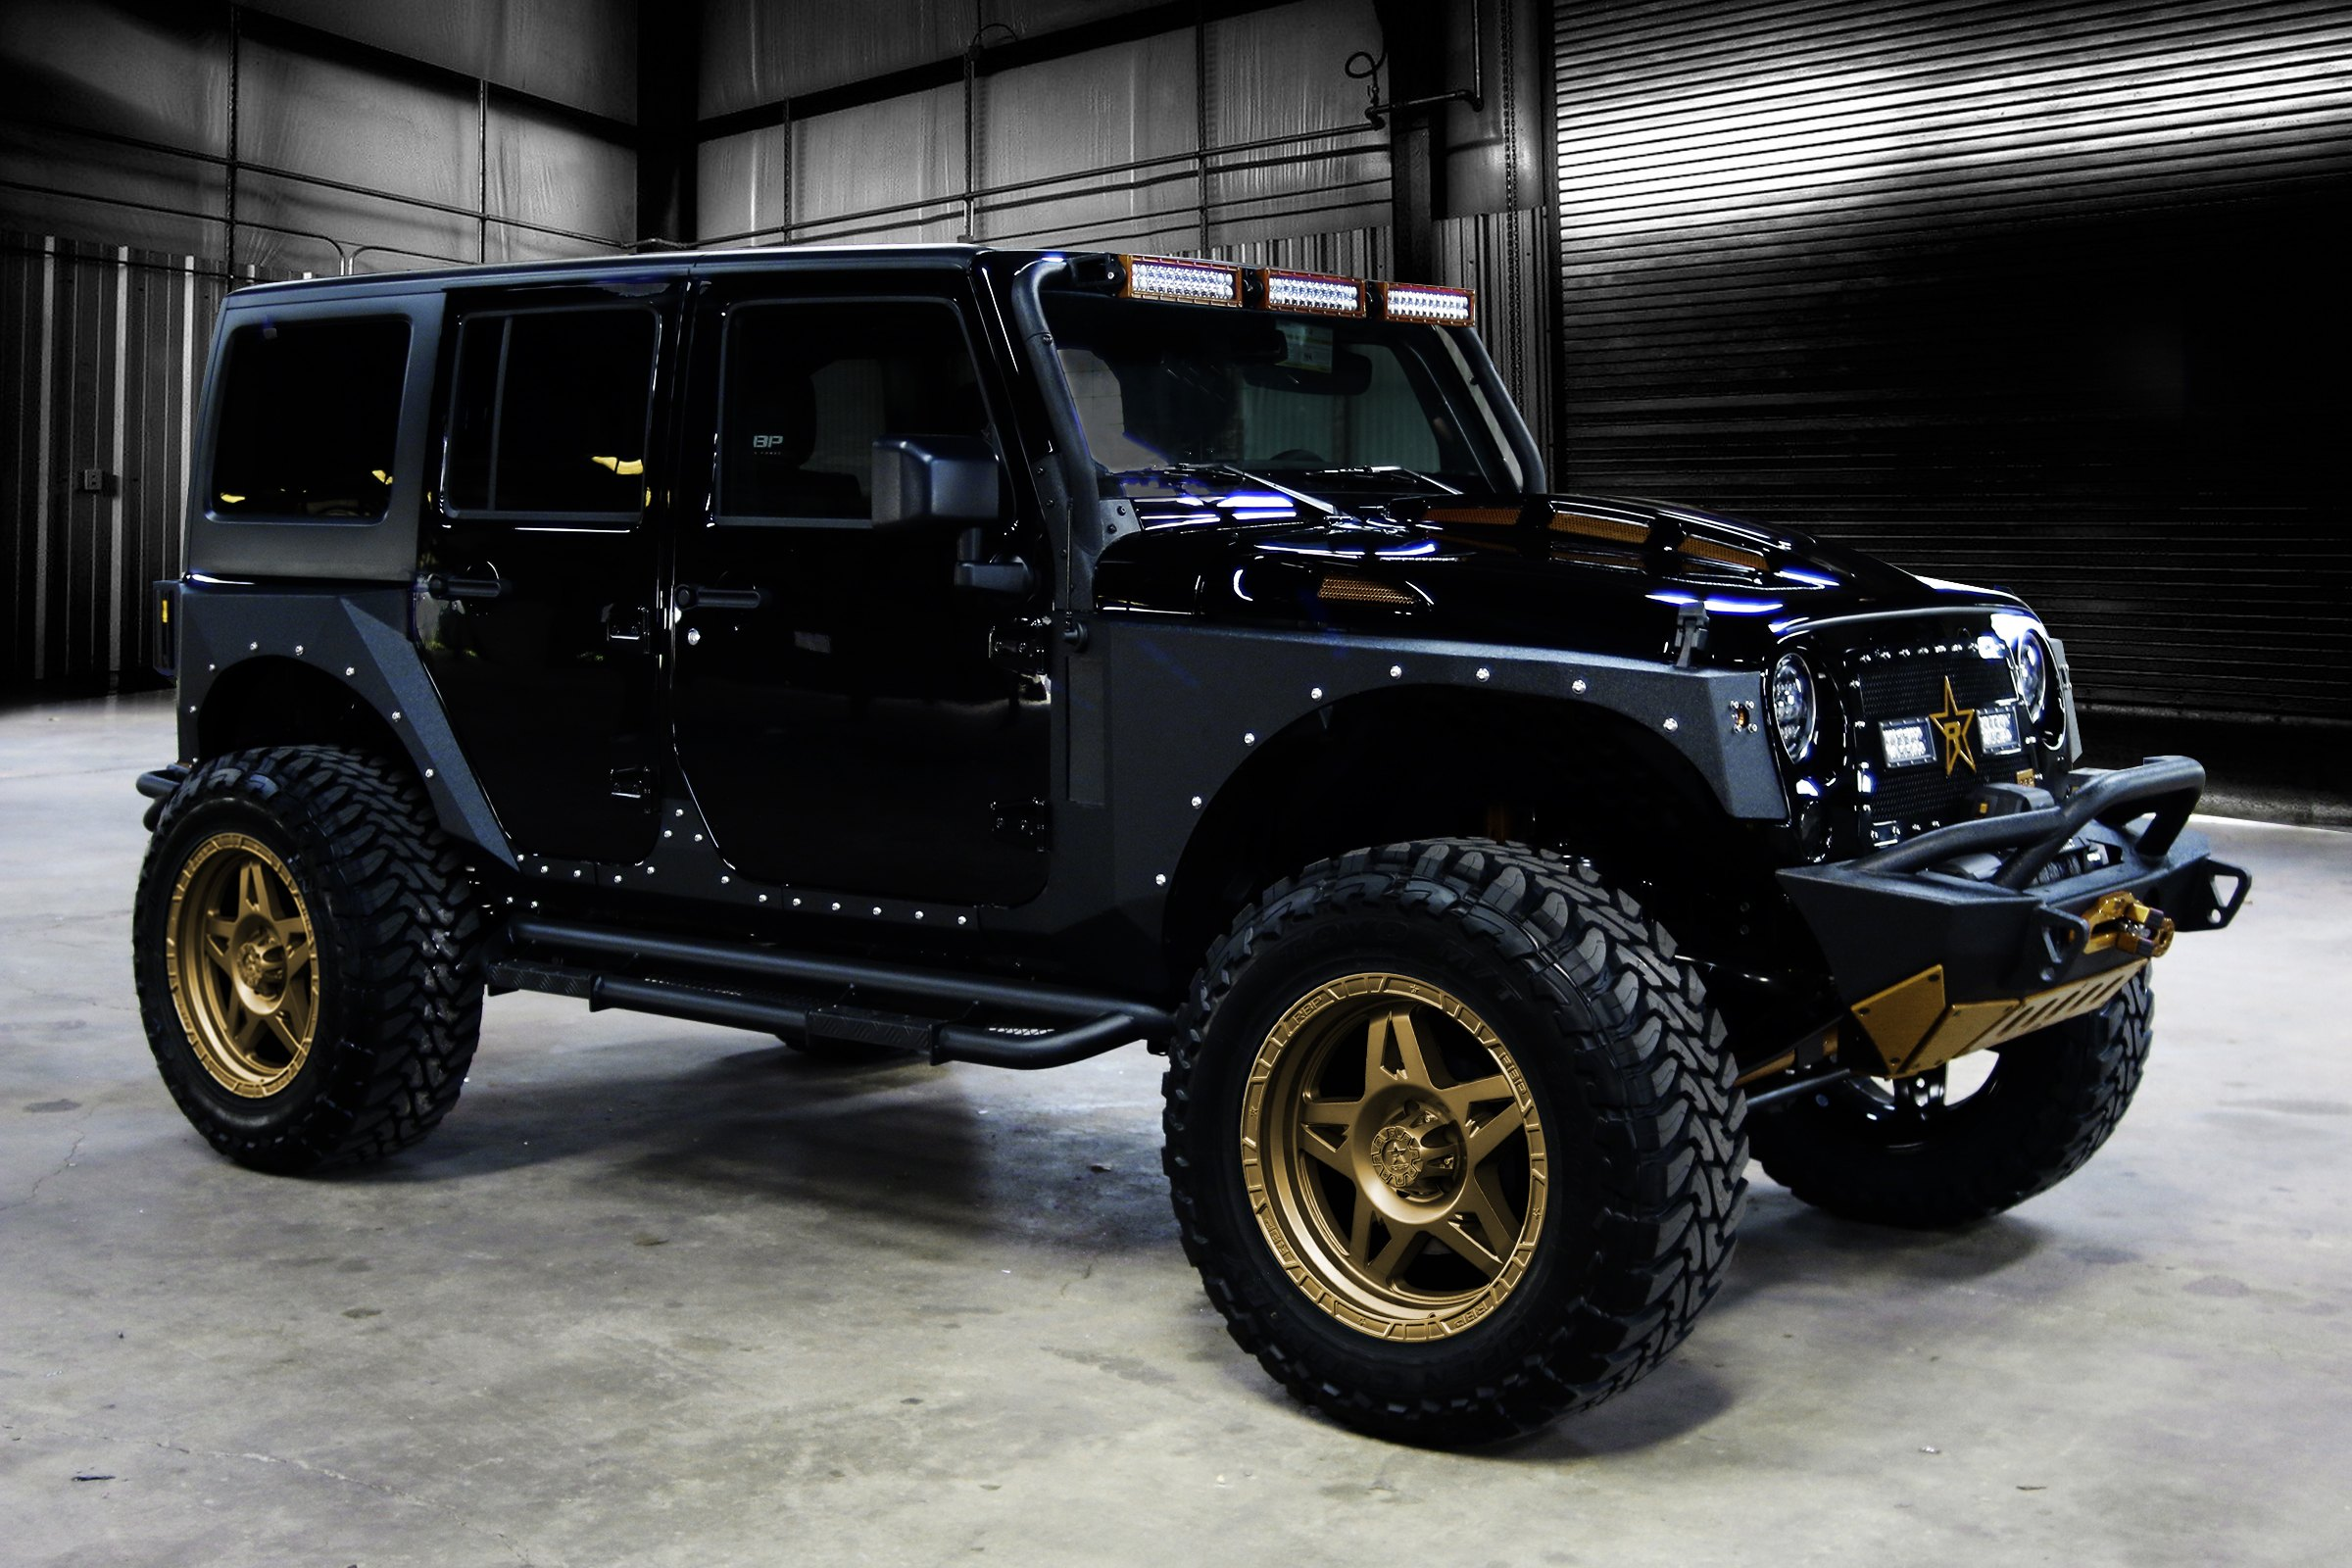 rbp jeep wrangler 2008 4 x 4 front and rear suspension lift kit. Black Bedroom Furniture Sets. Home Design Ideas